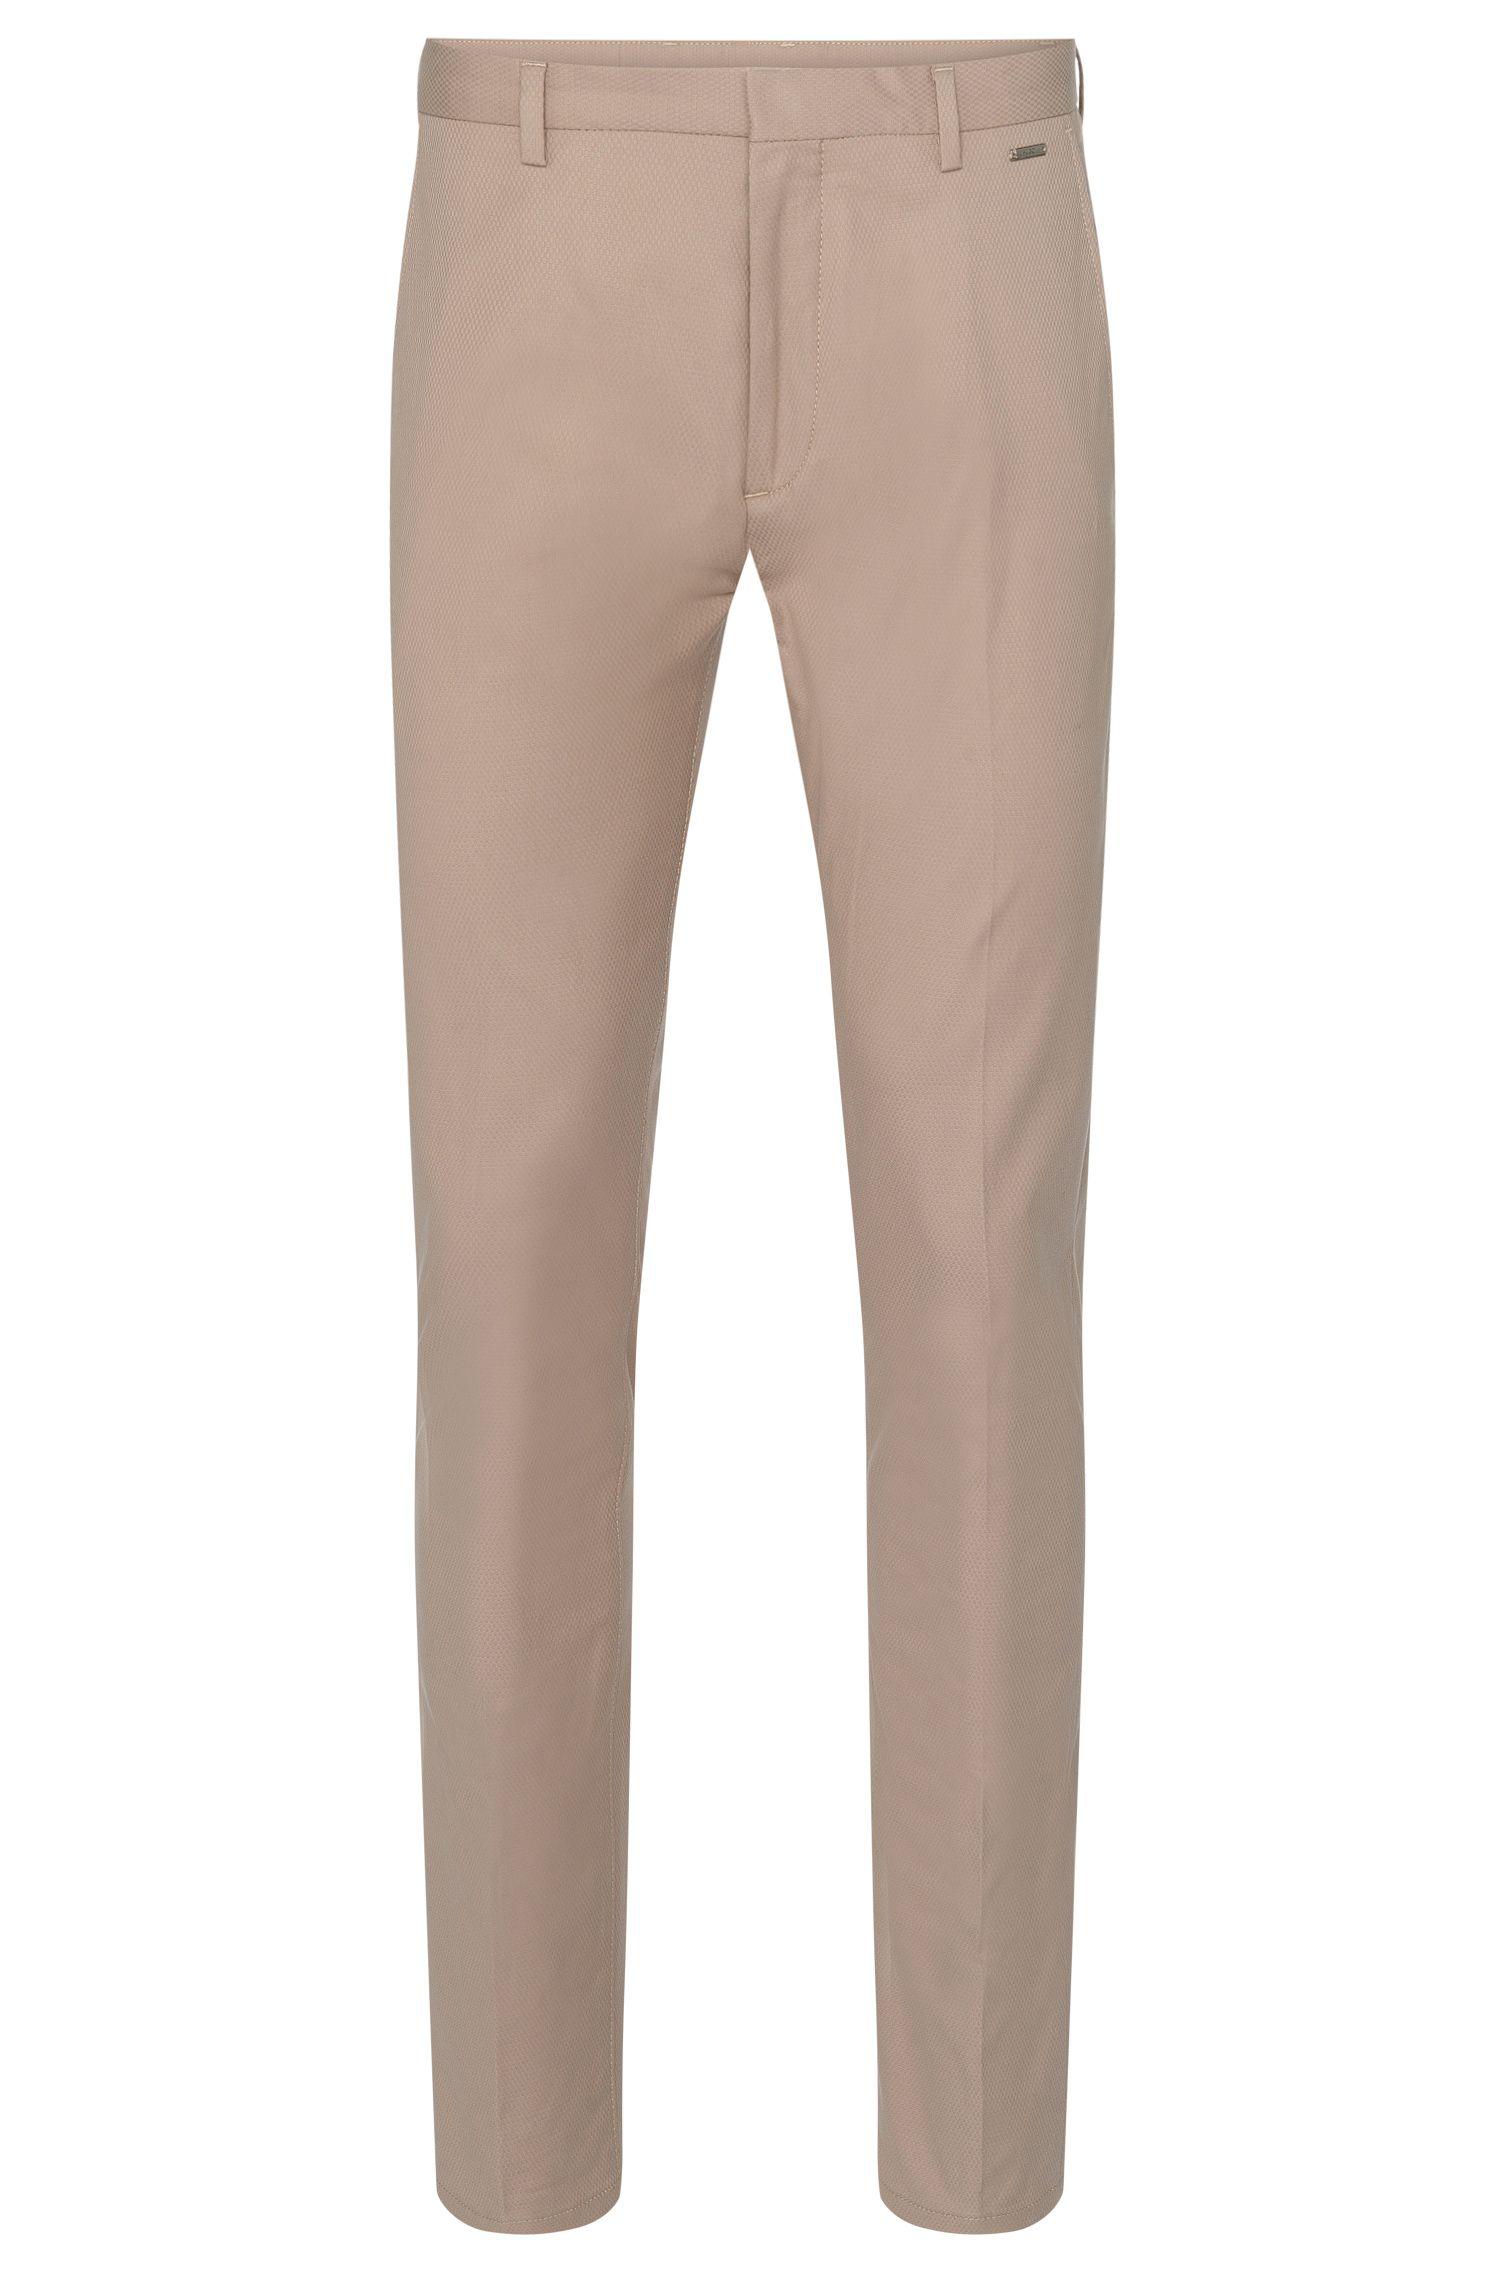 Stretch Cotton Blend Textured Pant, Regular Fit | Helgo